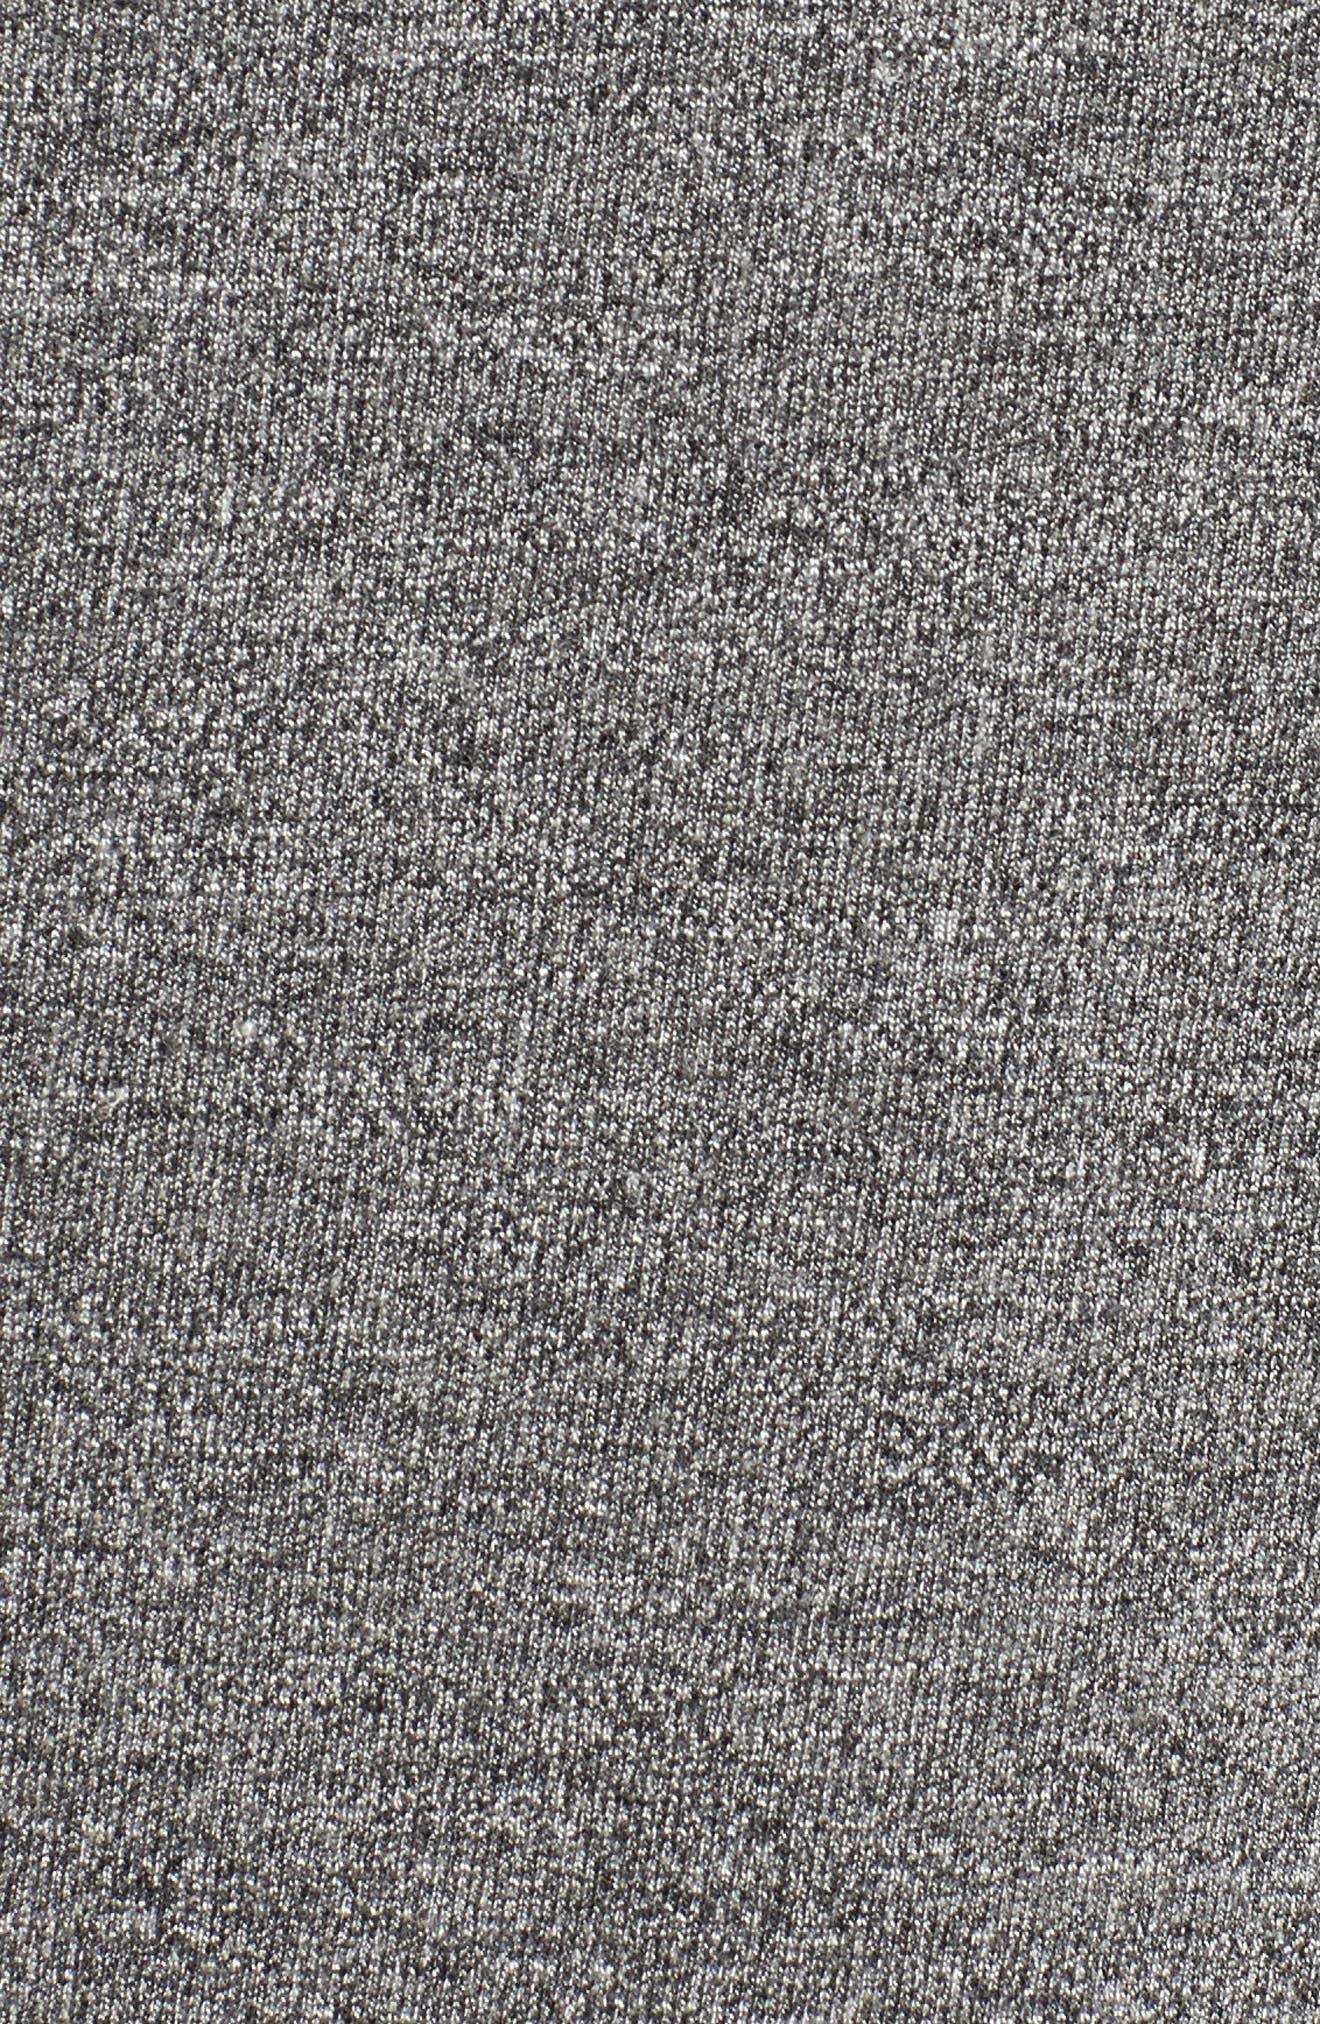 Stars Moon Sun Crop Sweatshirt,                             Alternate thumbnail 5, color,                             039